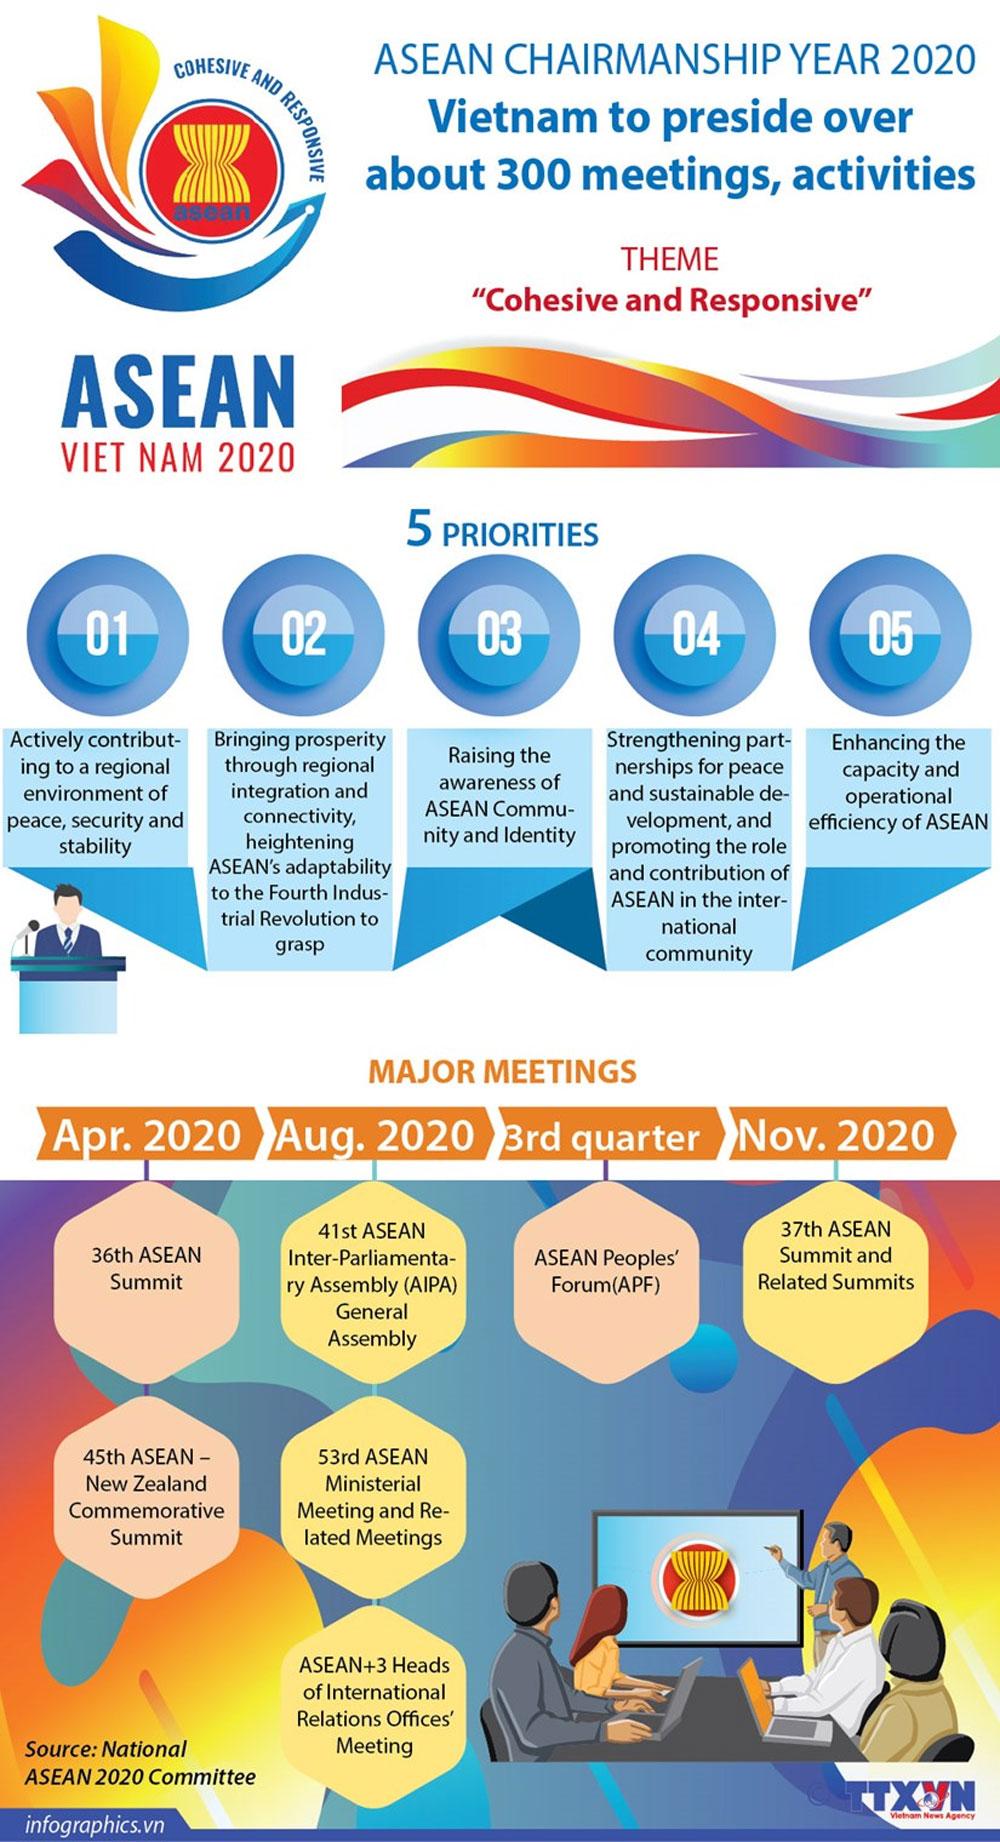 Vietnam, 300 meetings, ASEAN Chairmanship Year 2020, regional activities, sustainable development